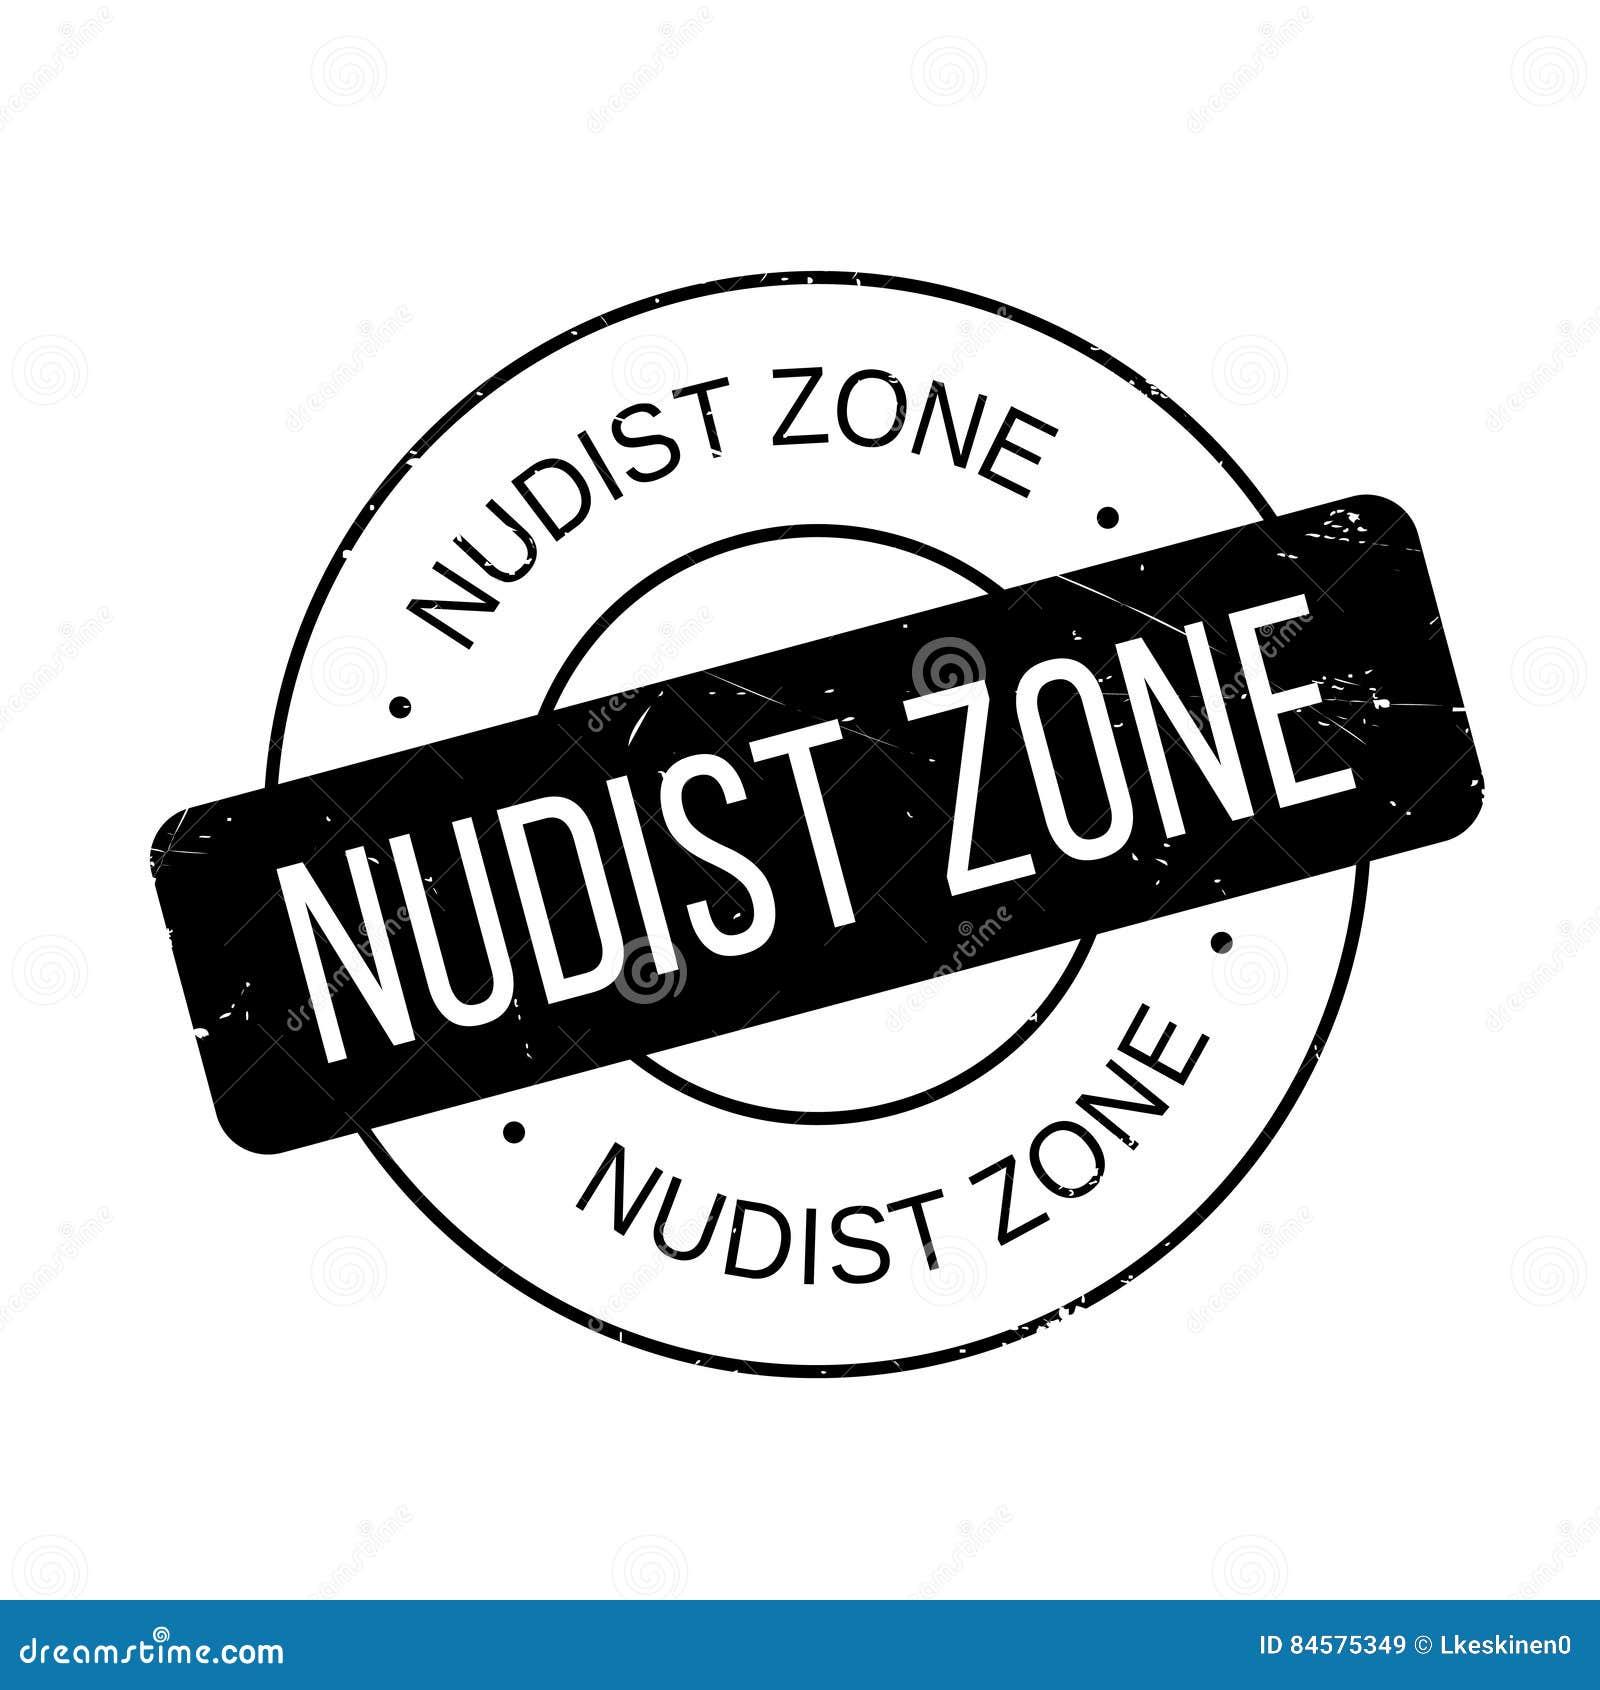 Nudist Zone Nudist Zone Rubber Stamp Stock Illustration